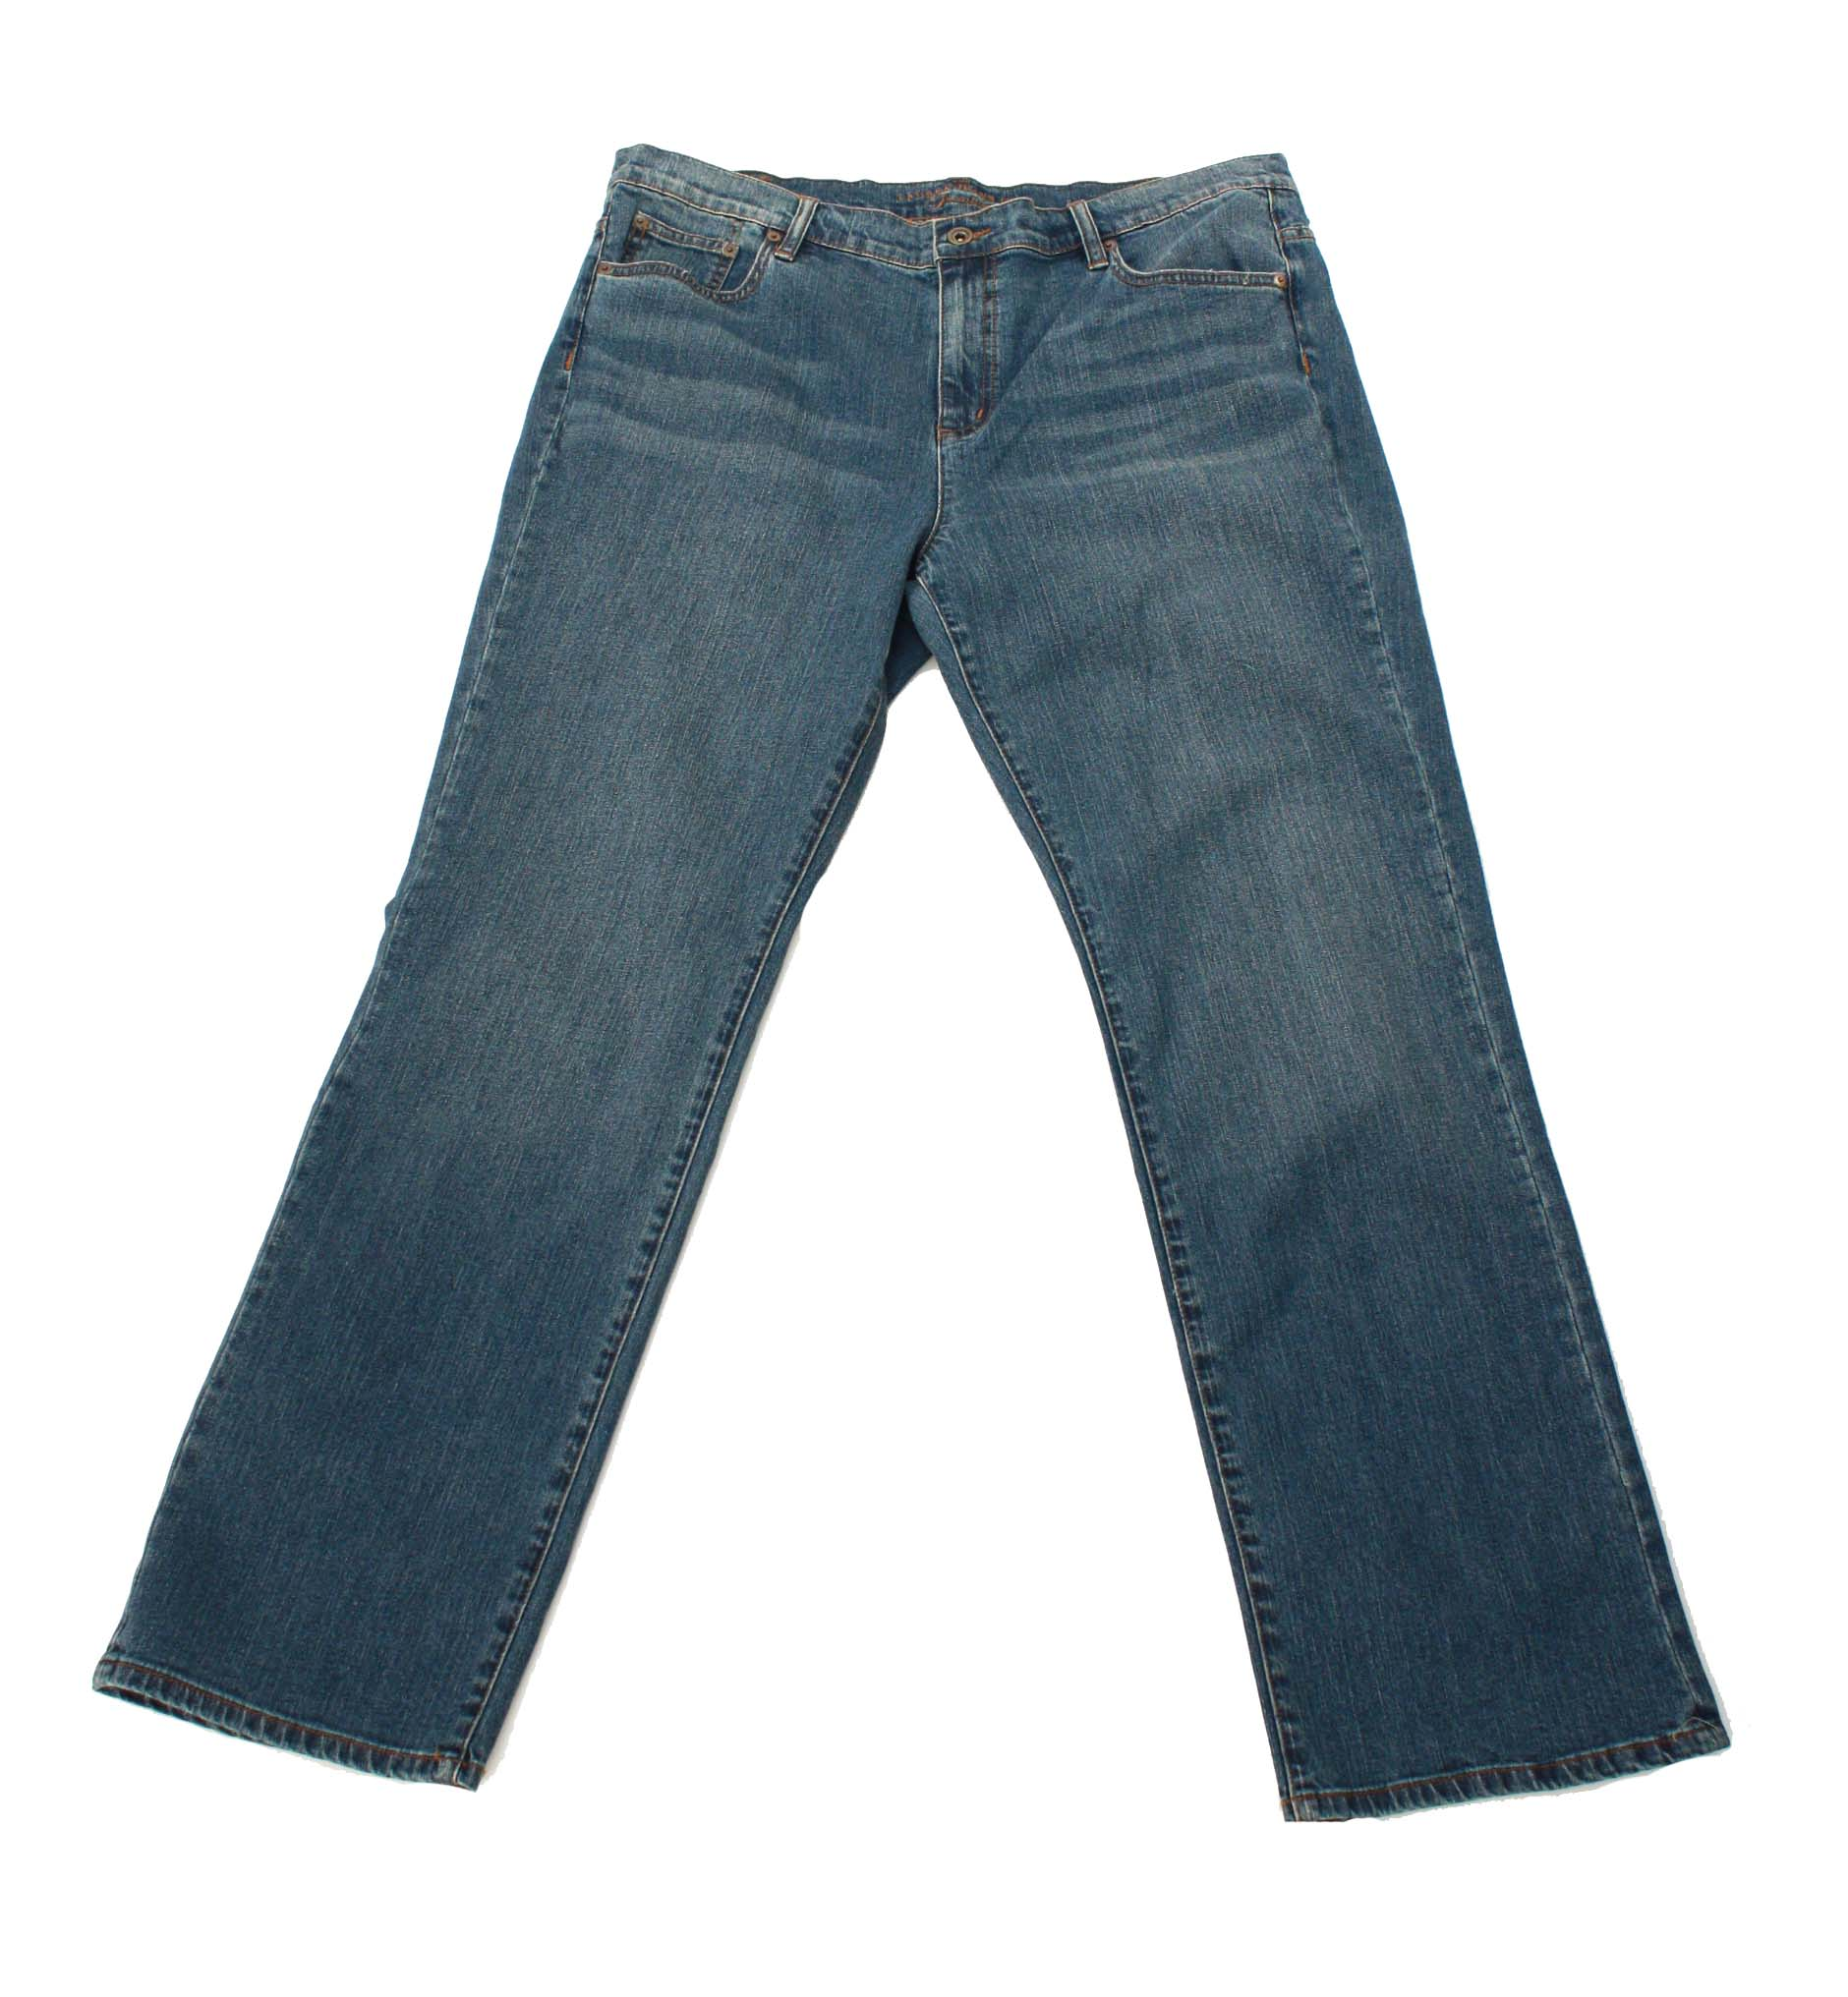 Ralph Lauren Jeans Company Women's Premium Denim Jeans at Sears.com